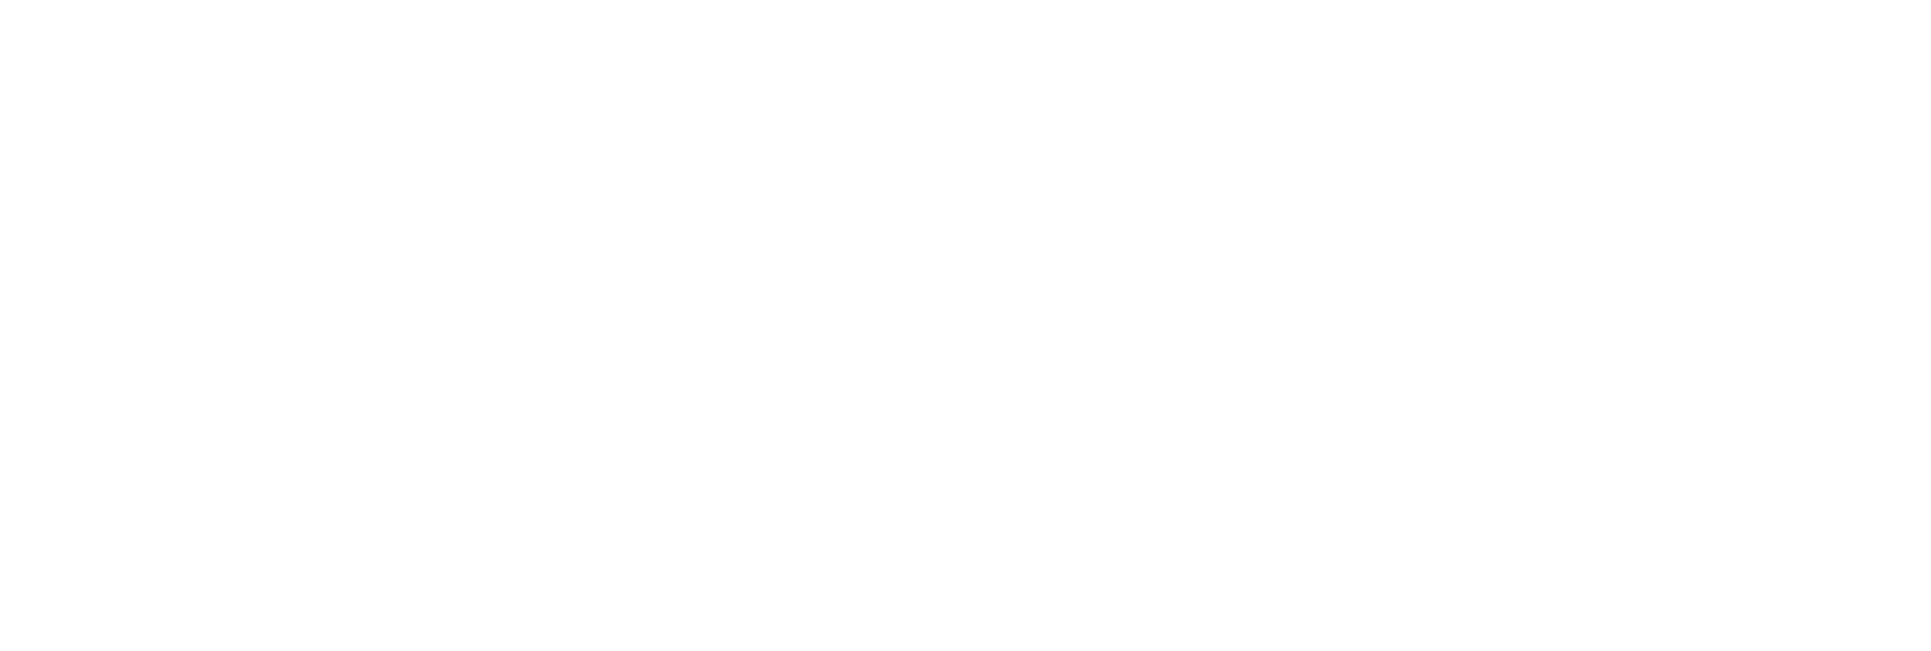 roadex_vit payoff